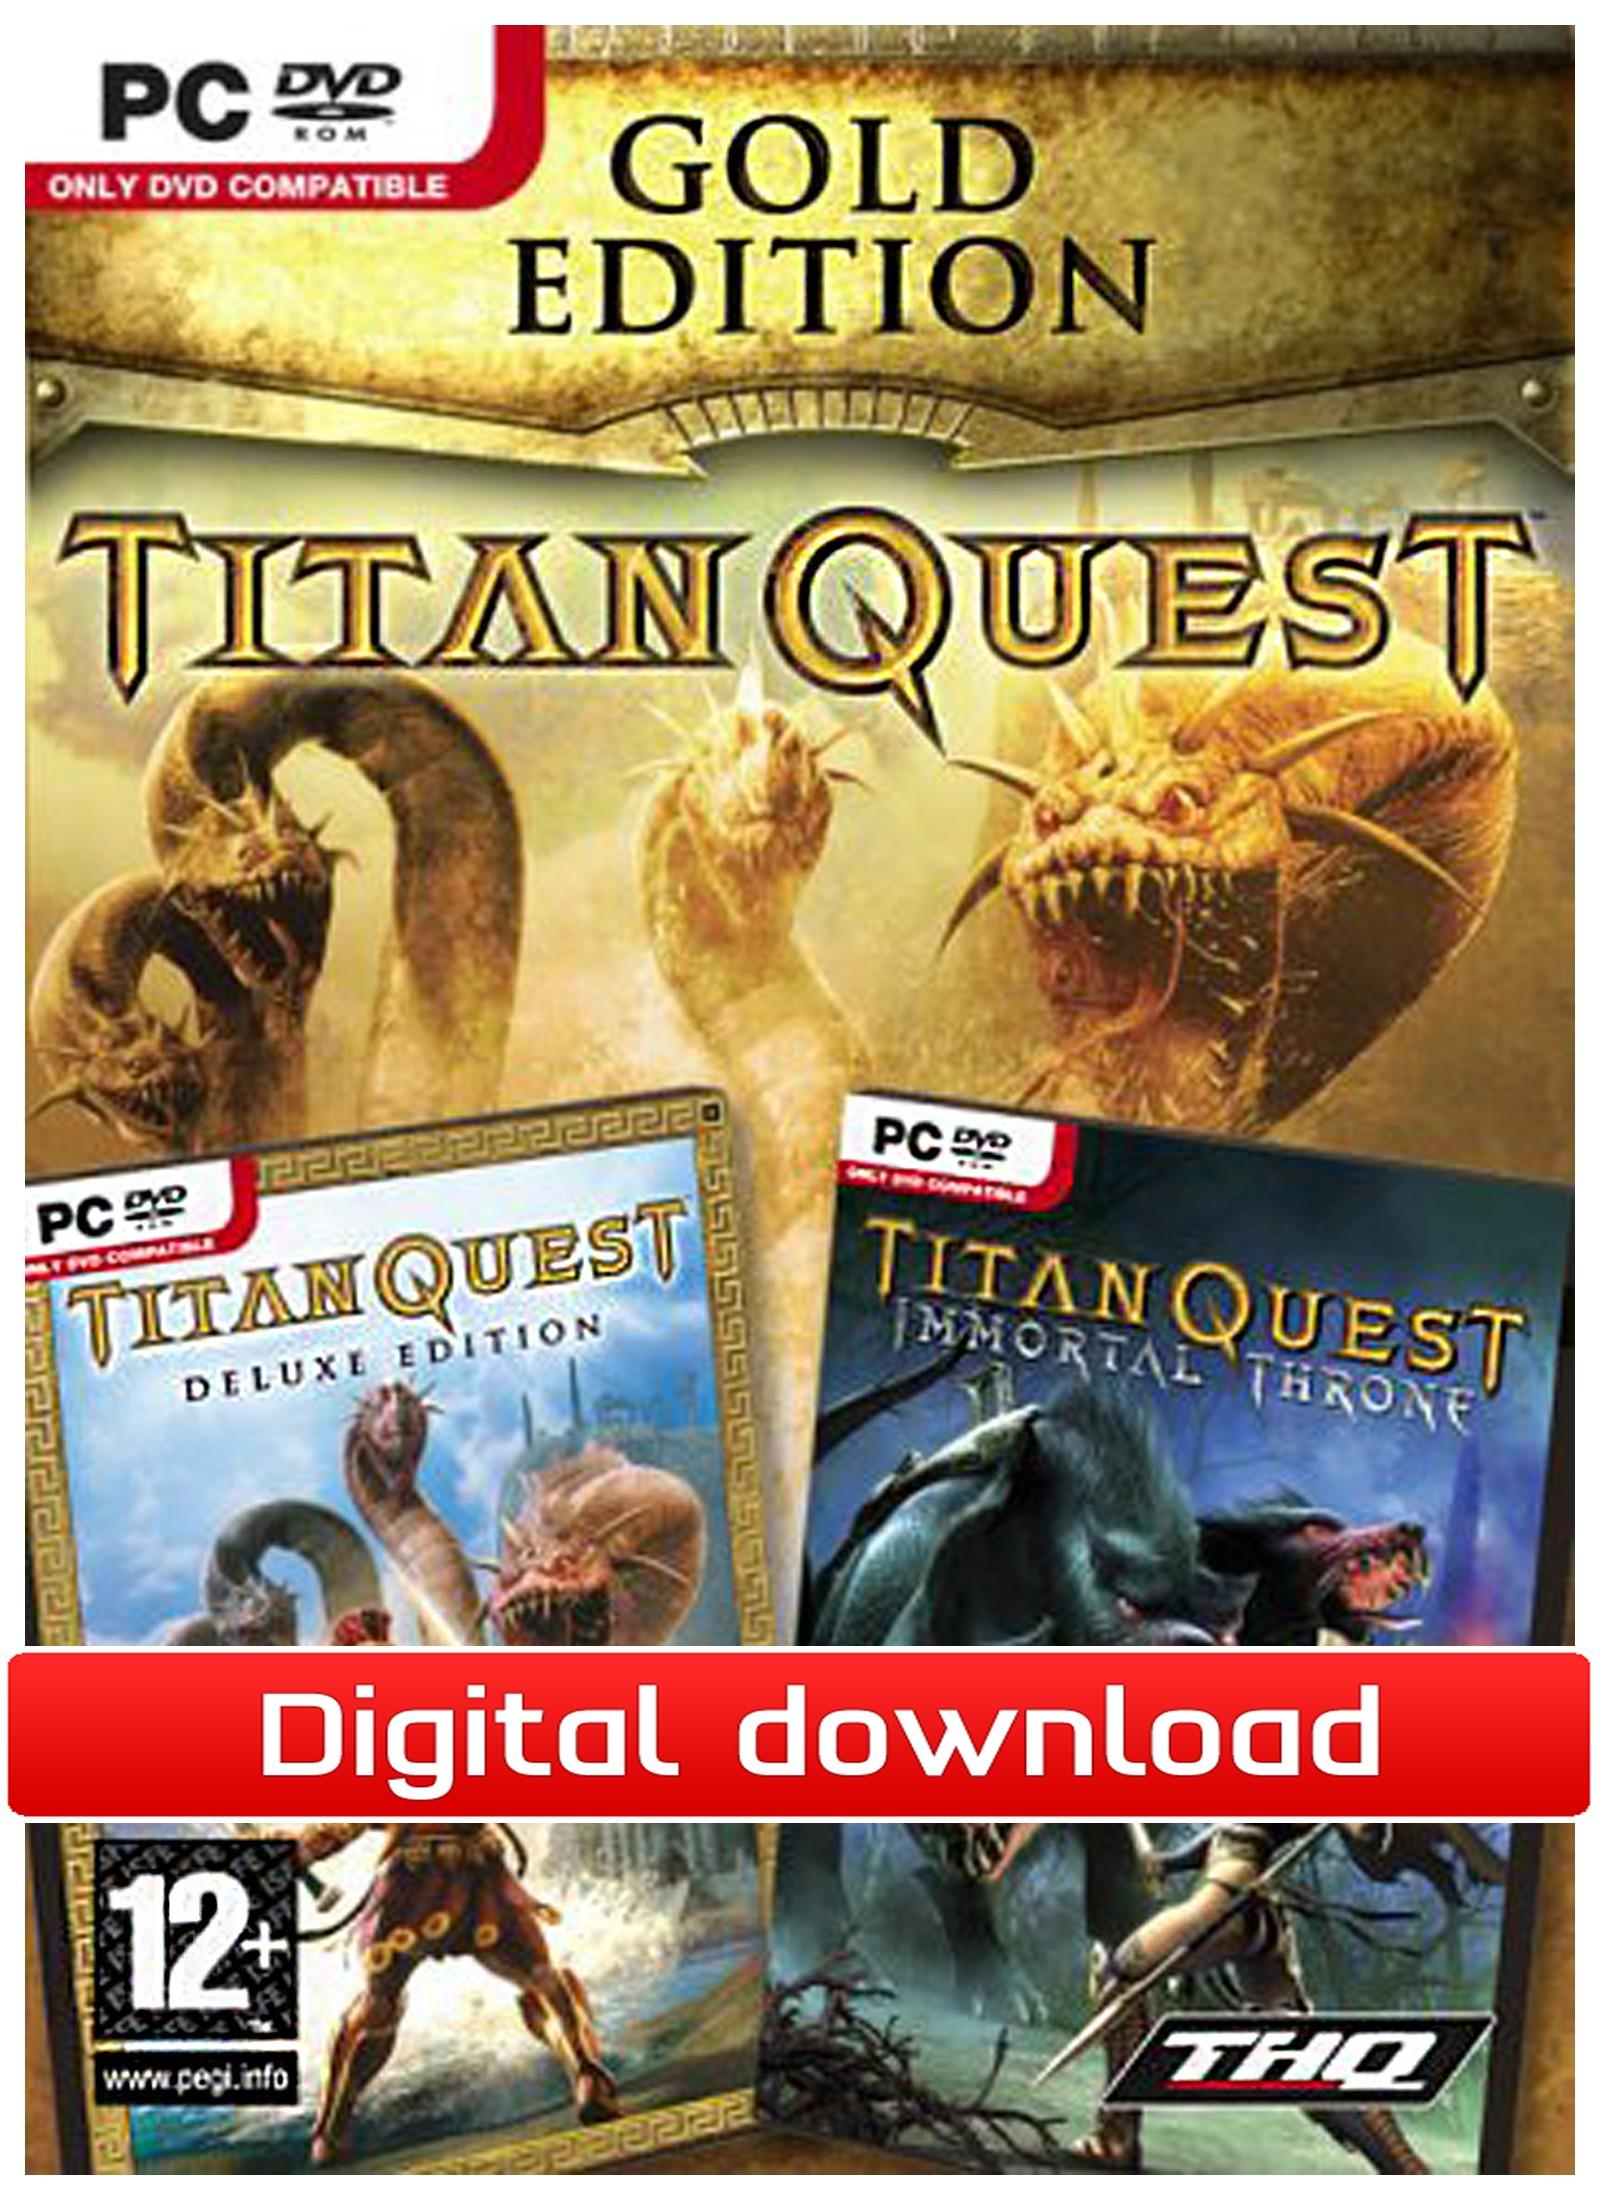 Titan Quest: Gold Edition (PC nedlastning) PCDD33870